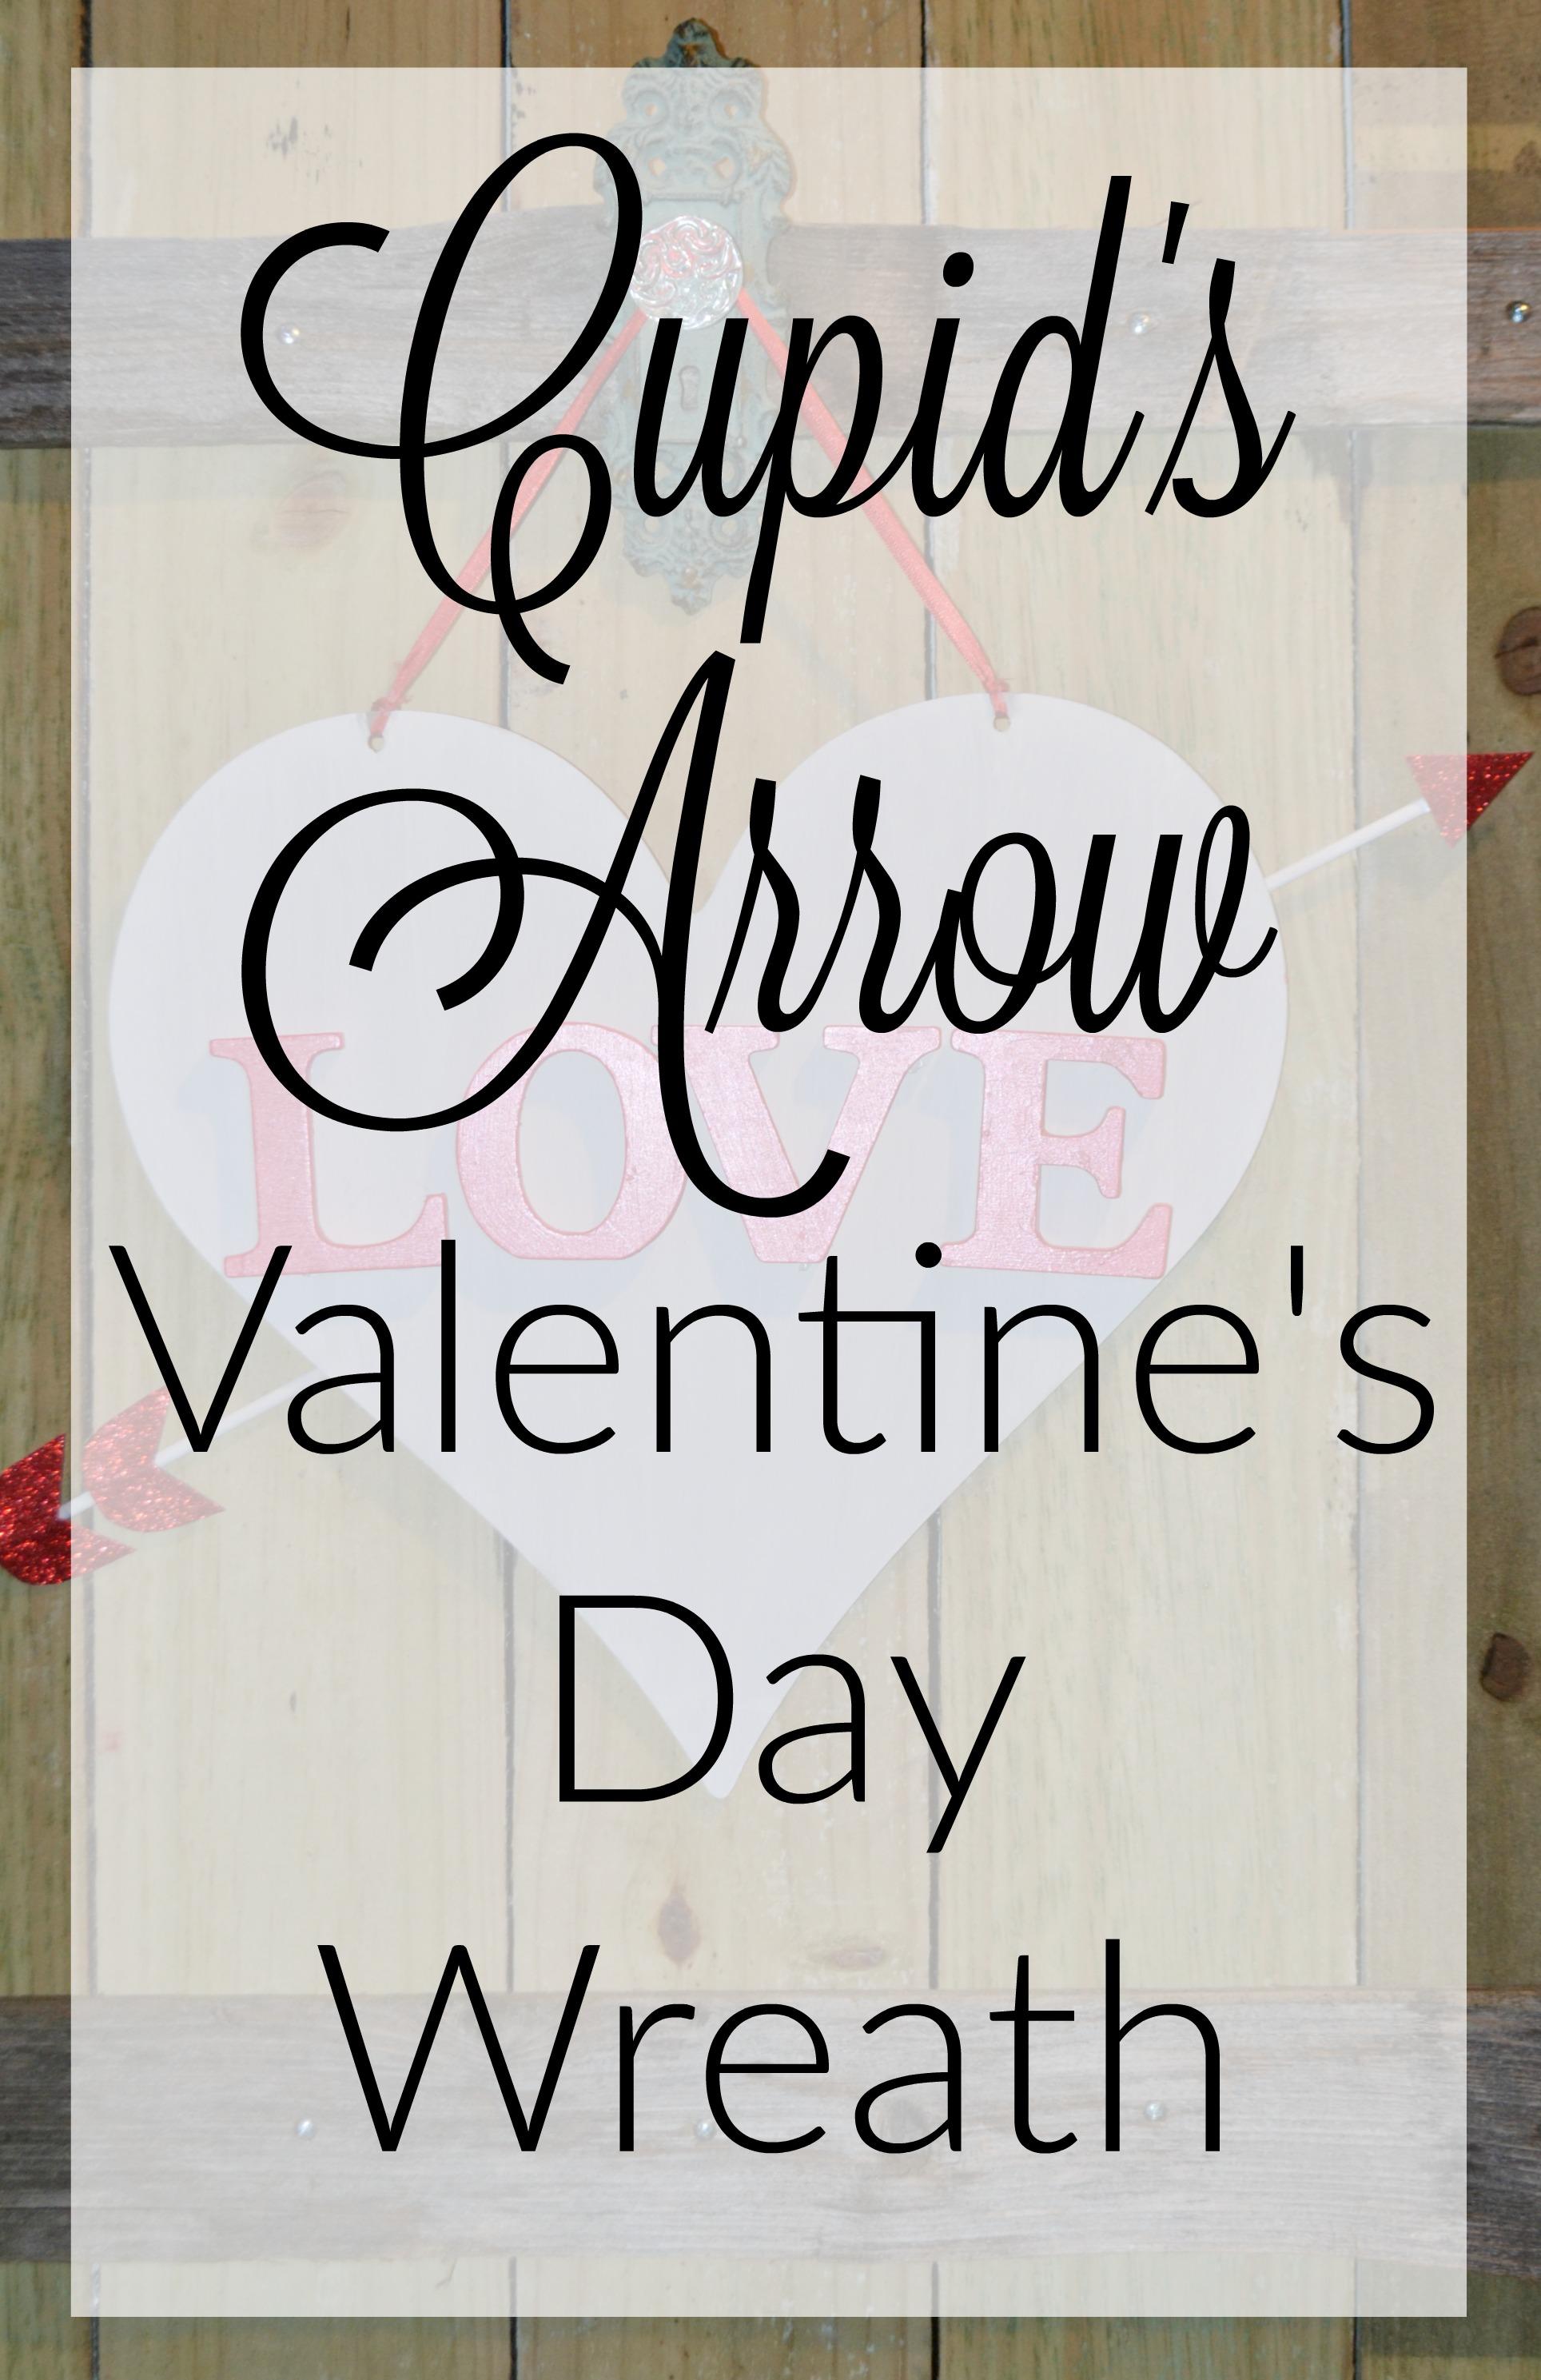 Cupid's Arrow Valentine's Day Wreath